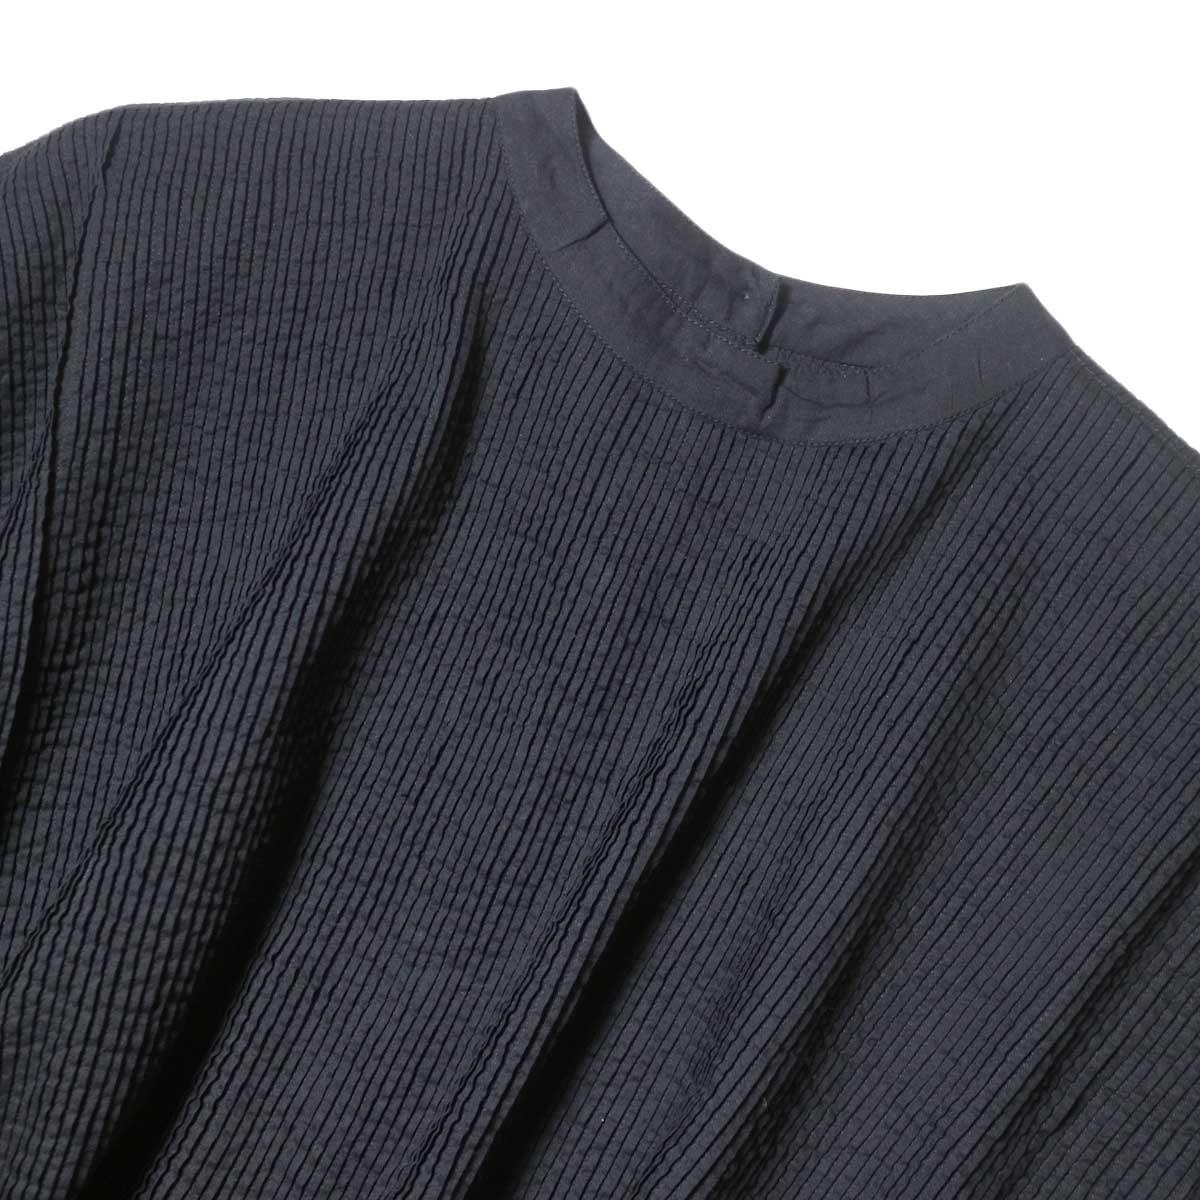 maison de soil / BACK OPENING STAND COLLAR SHIRT WITH MINI PINTUCK (Black) 襟